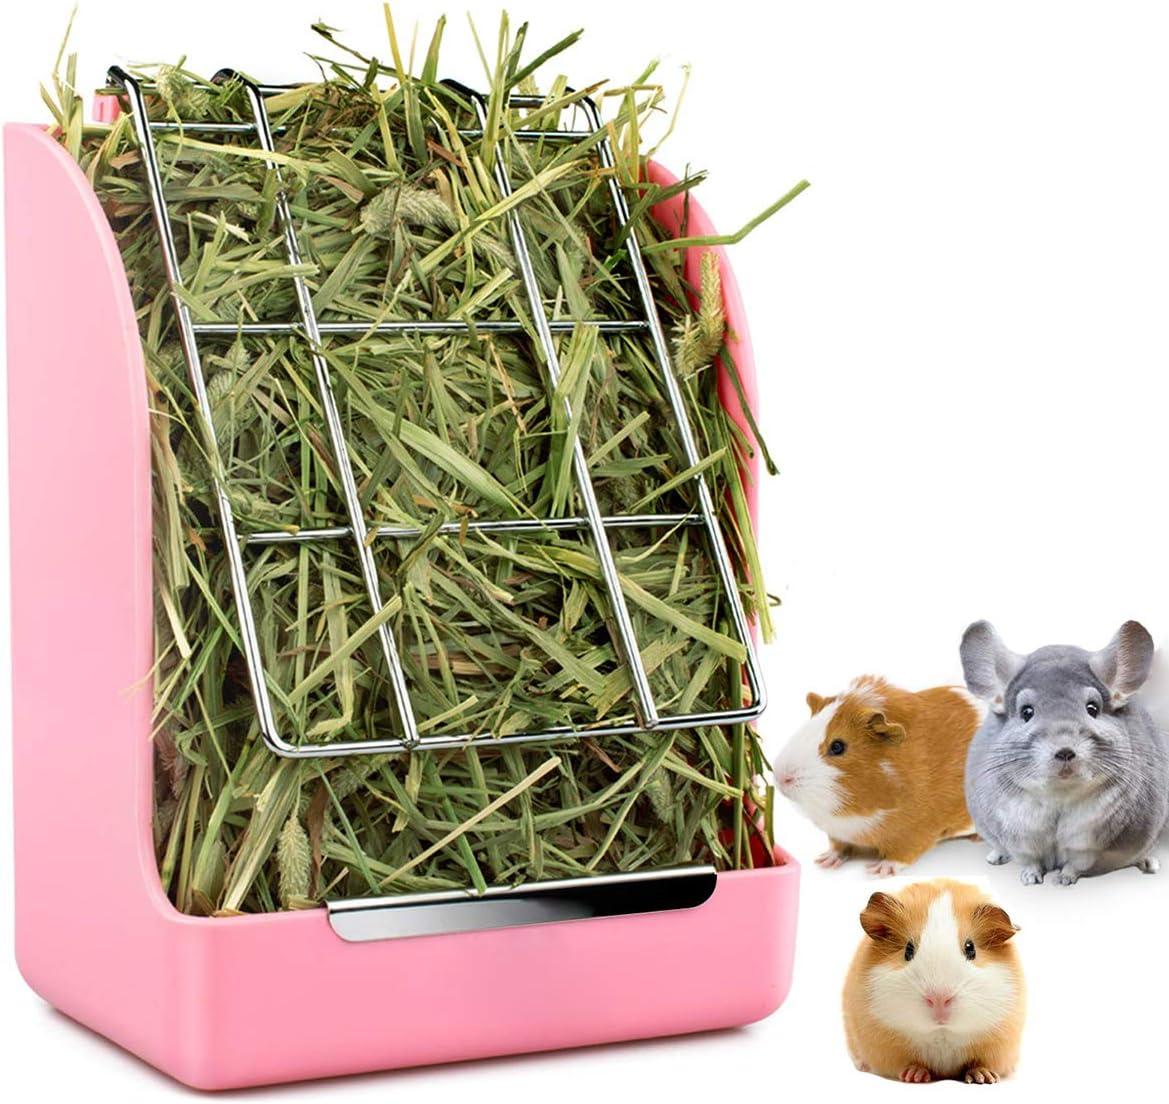 STKYGOOD Rabbit Feeder Bunny Guinea Pig Hay Feeder,Hay Guinea Pig Hay Feeder,Chinchilla Plastic Food Bowl